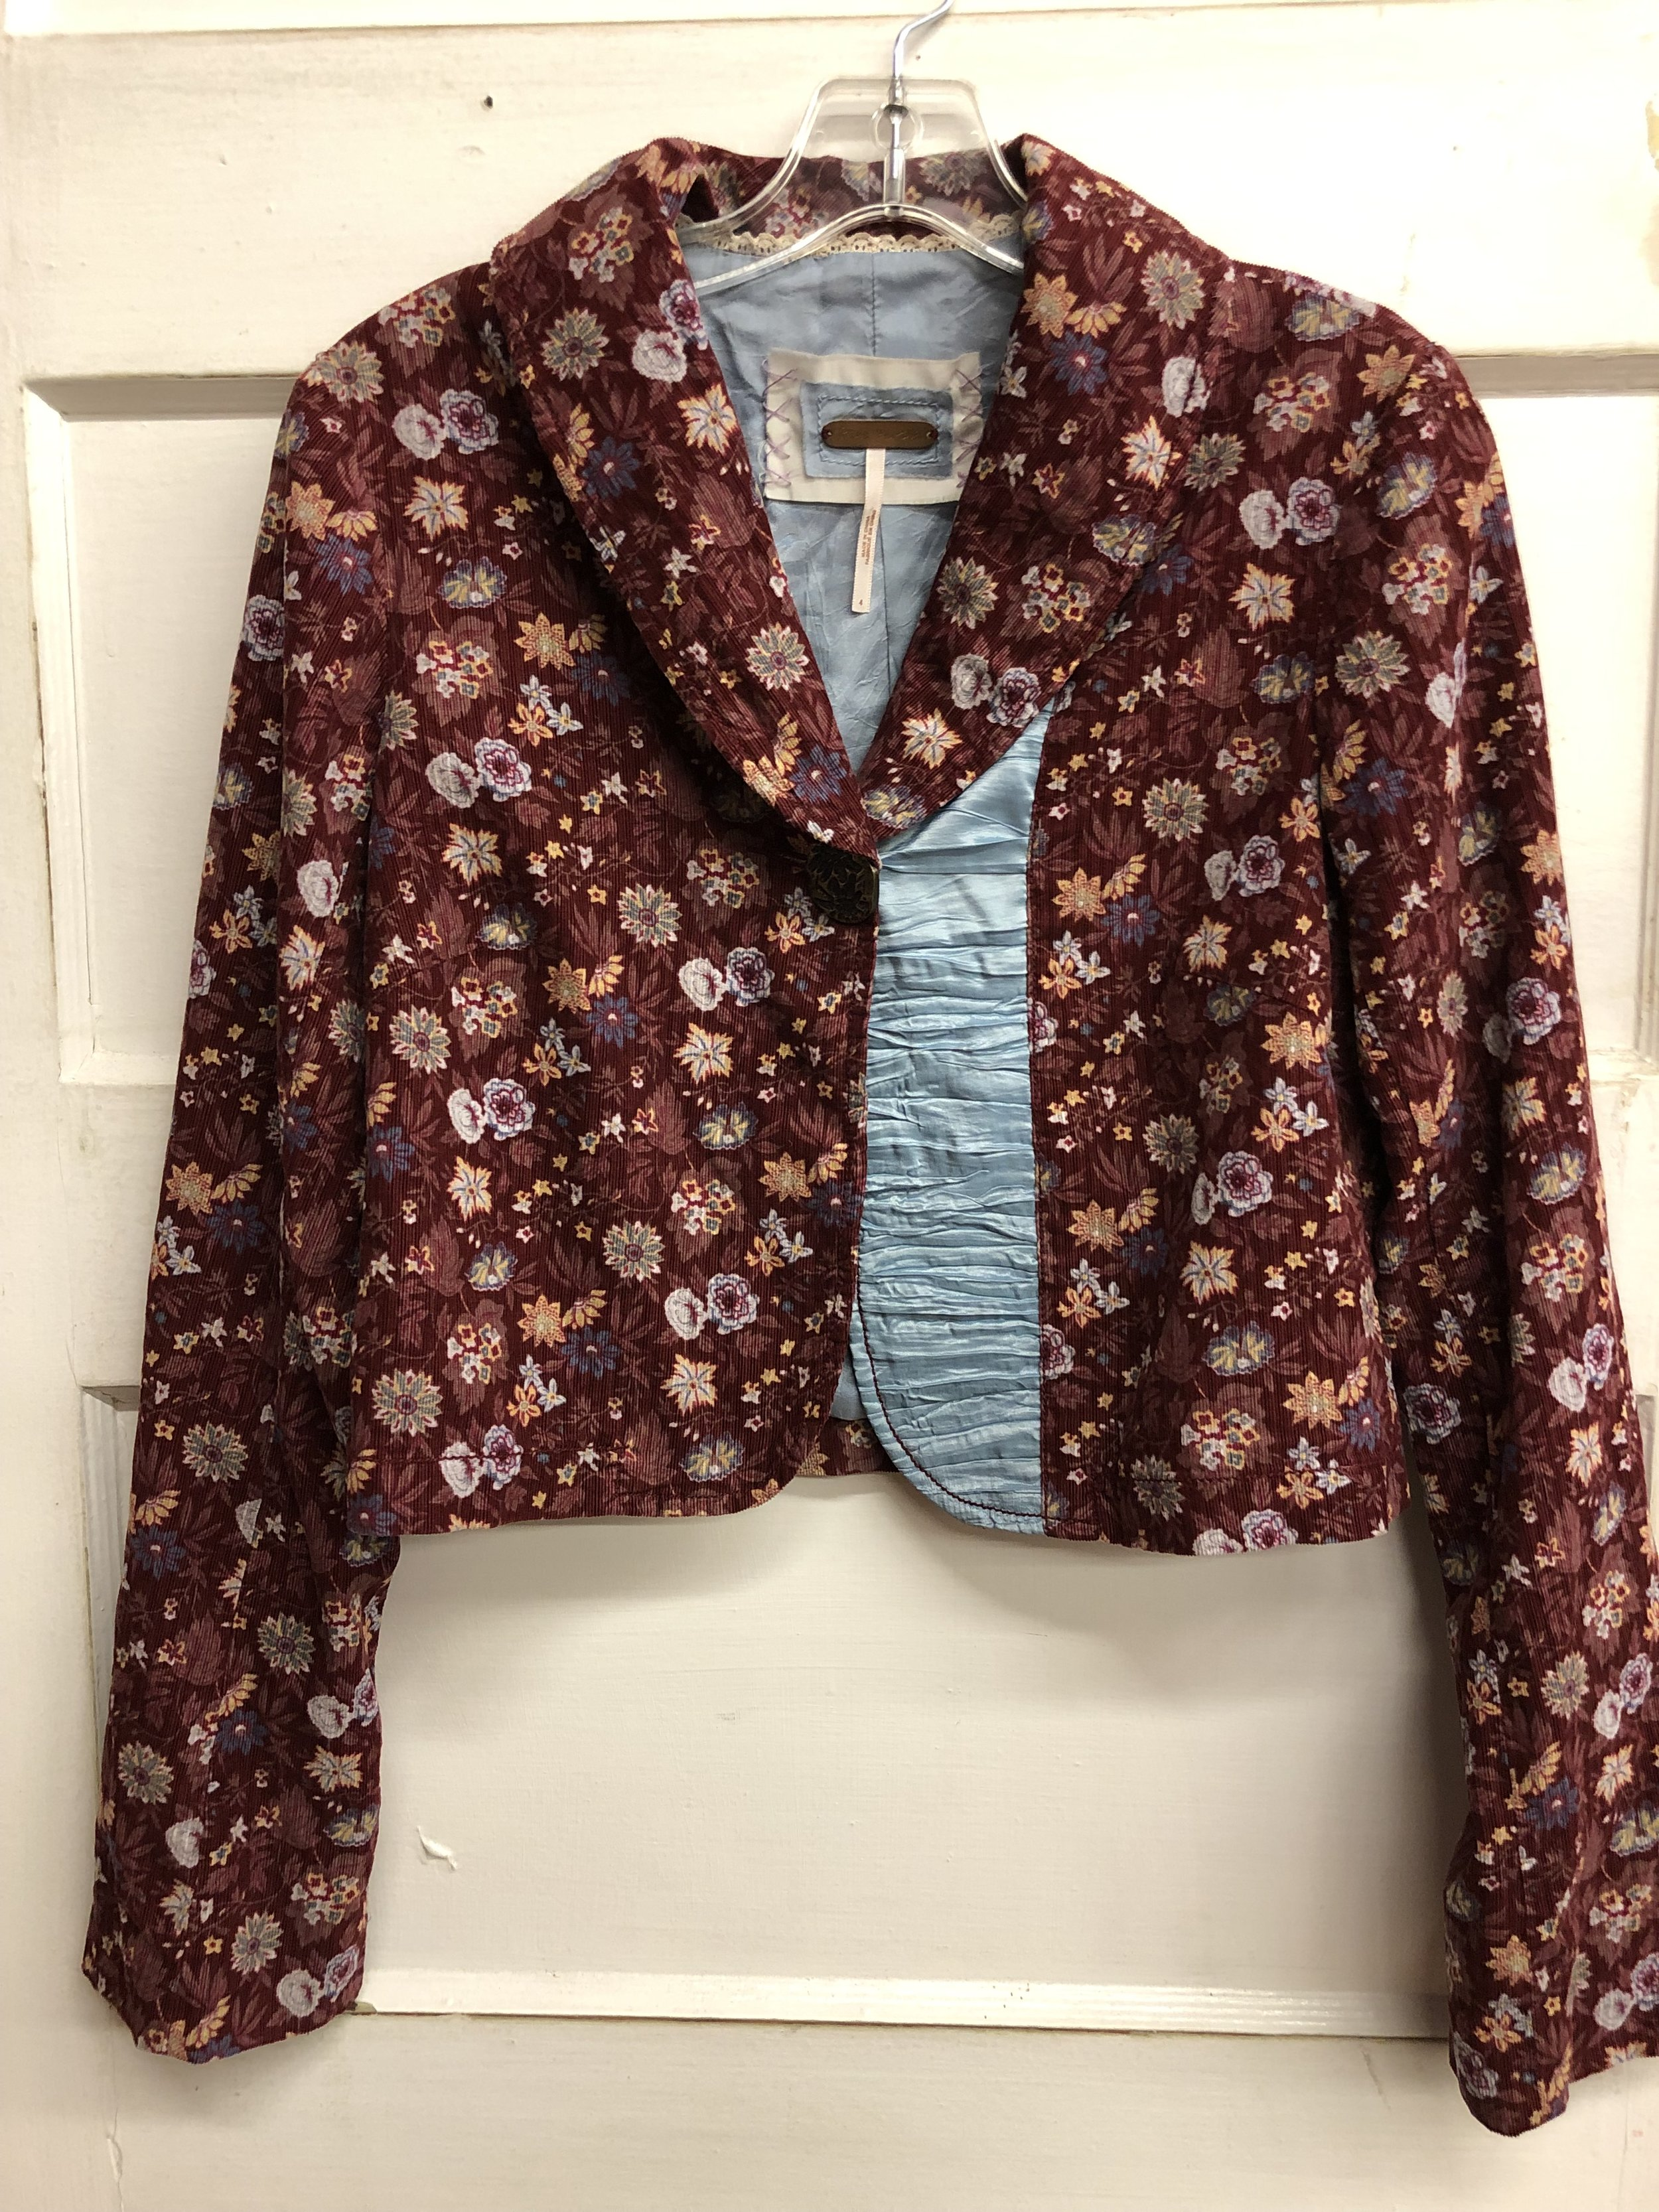 Free People Velveteen Jacket -XS-$38.99